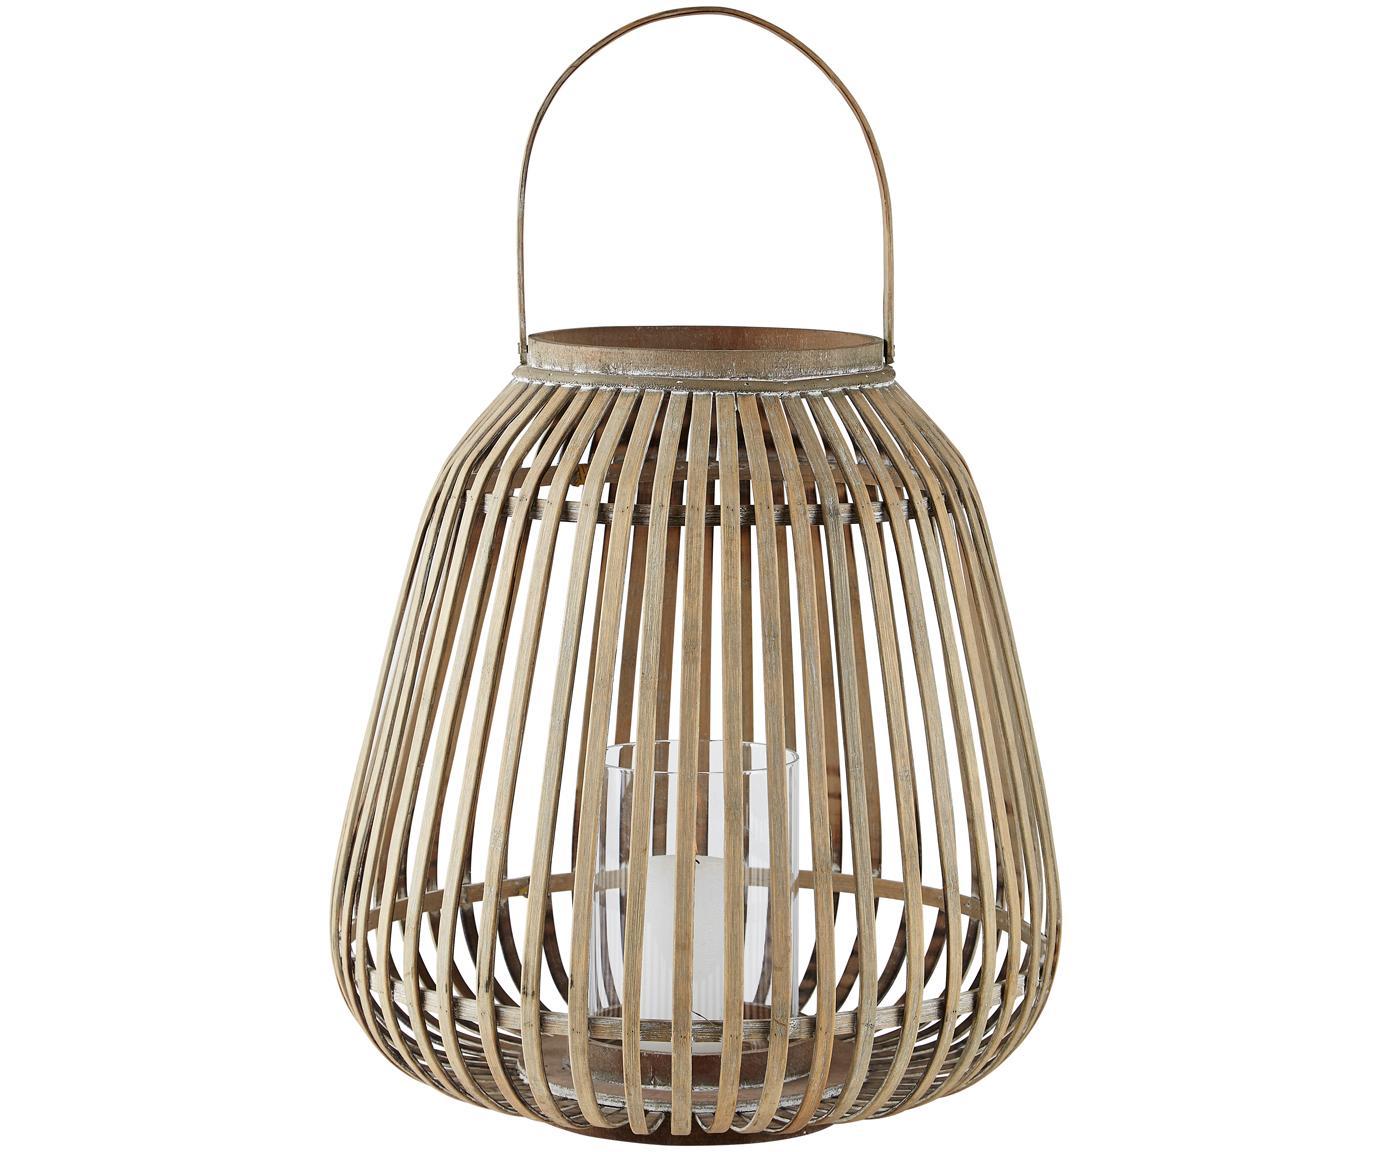 Laterne Alma, Gestell: Bambus, Windlicht: Glas, Gestell: Bambus<br>Windlicht: Transparent, Ø 37 x H 40 cm